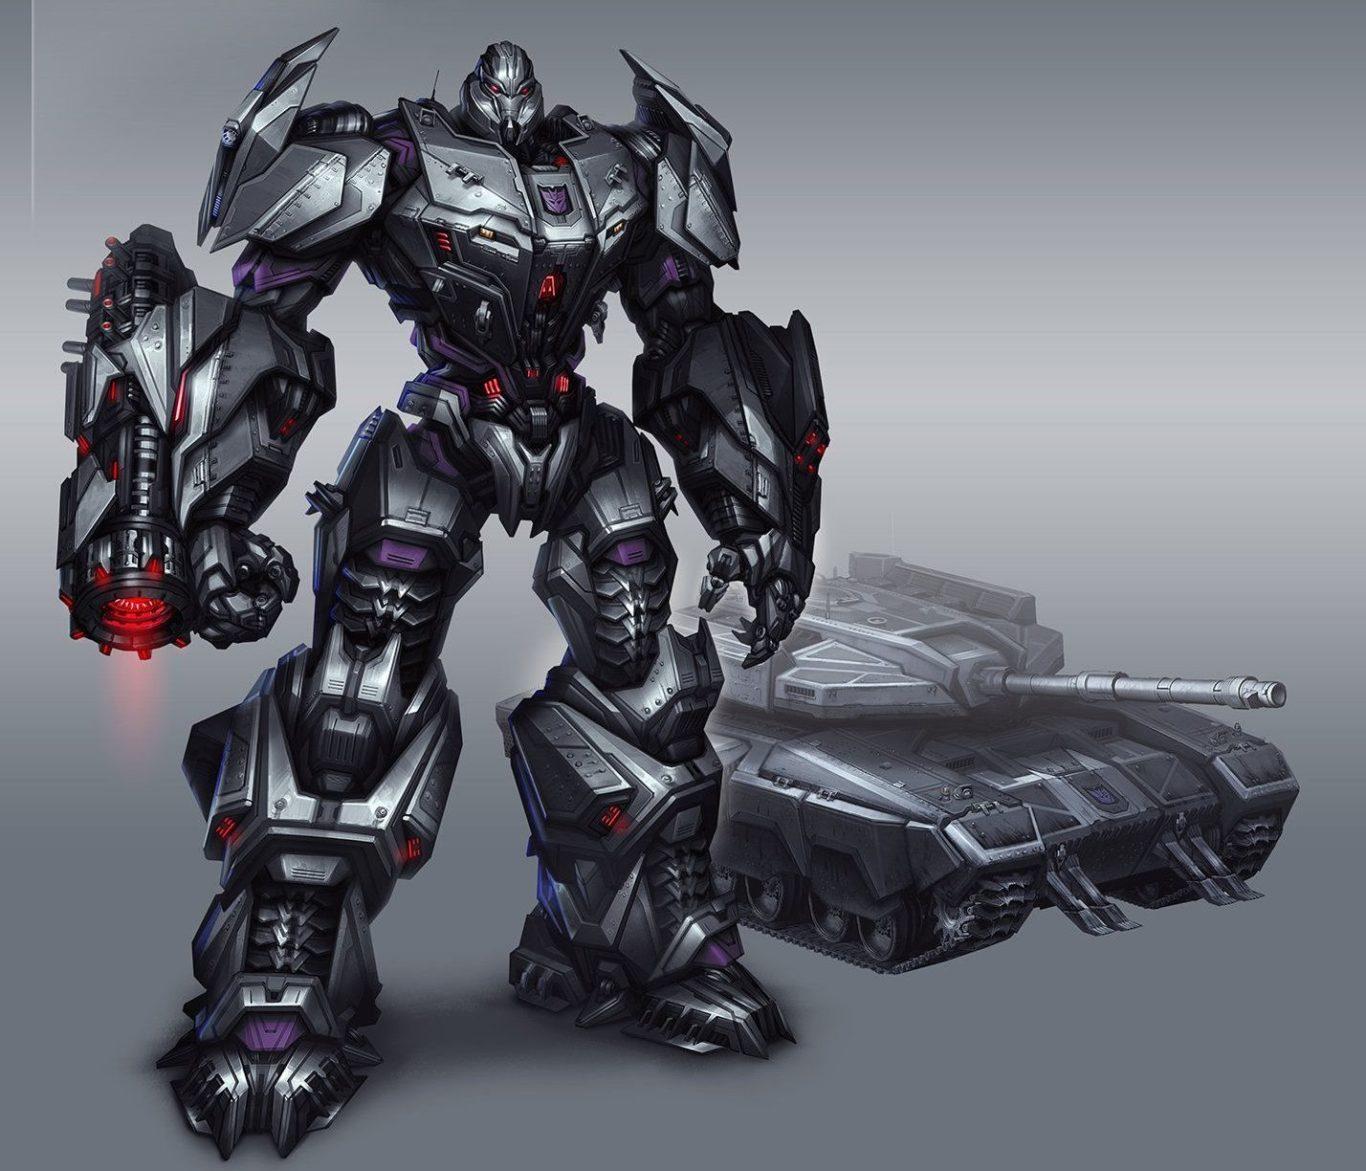 Transformers 1 3